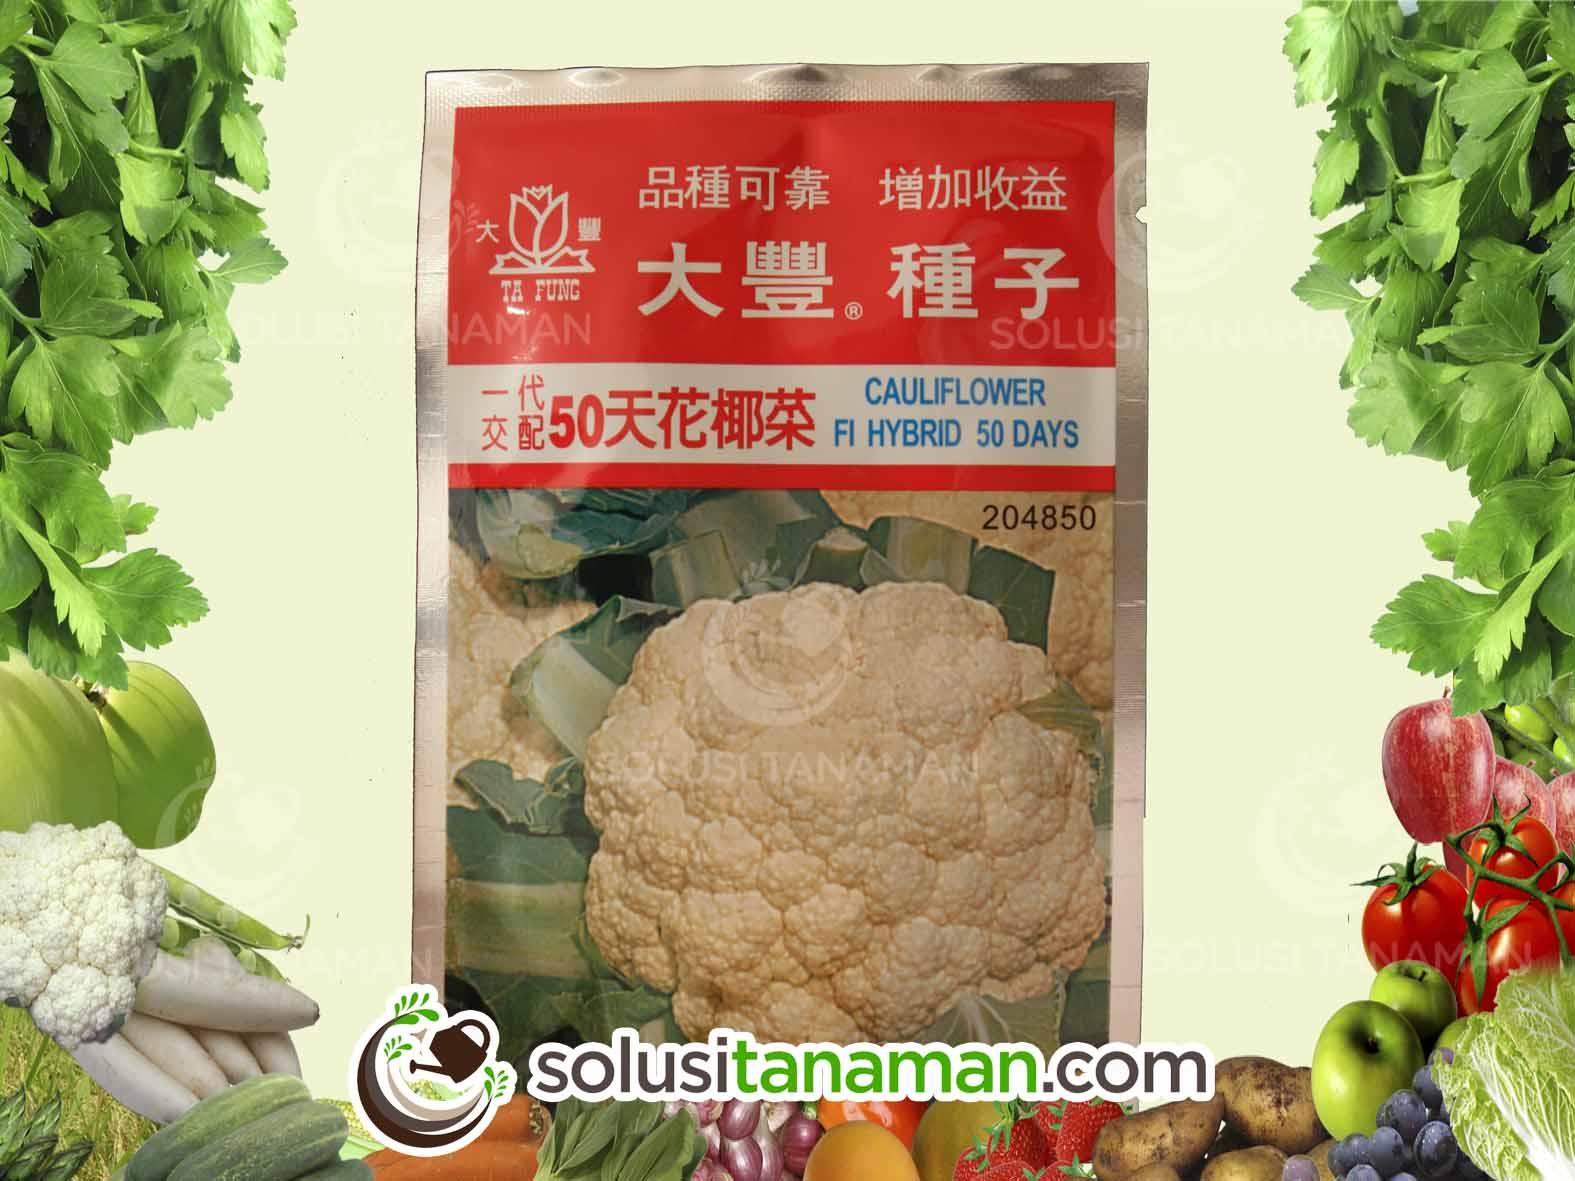 Bunga Kembang Kol 50 F1 10g Bibit Benih Tanaman Sayur Hidroponik Solusi Tanaman